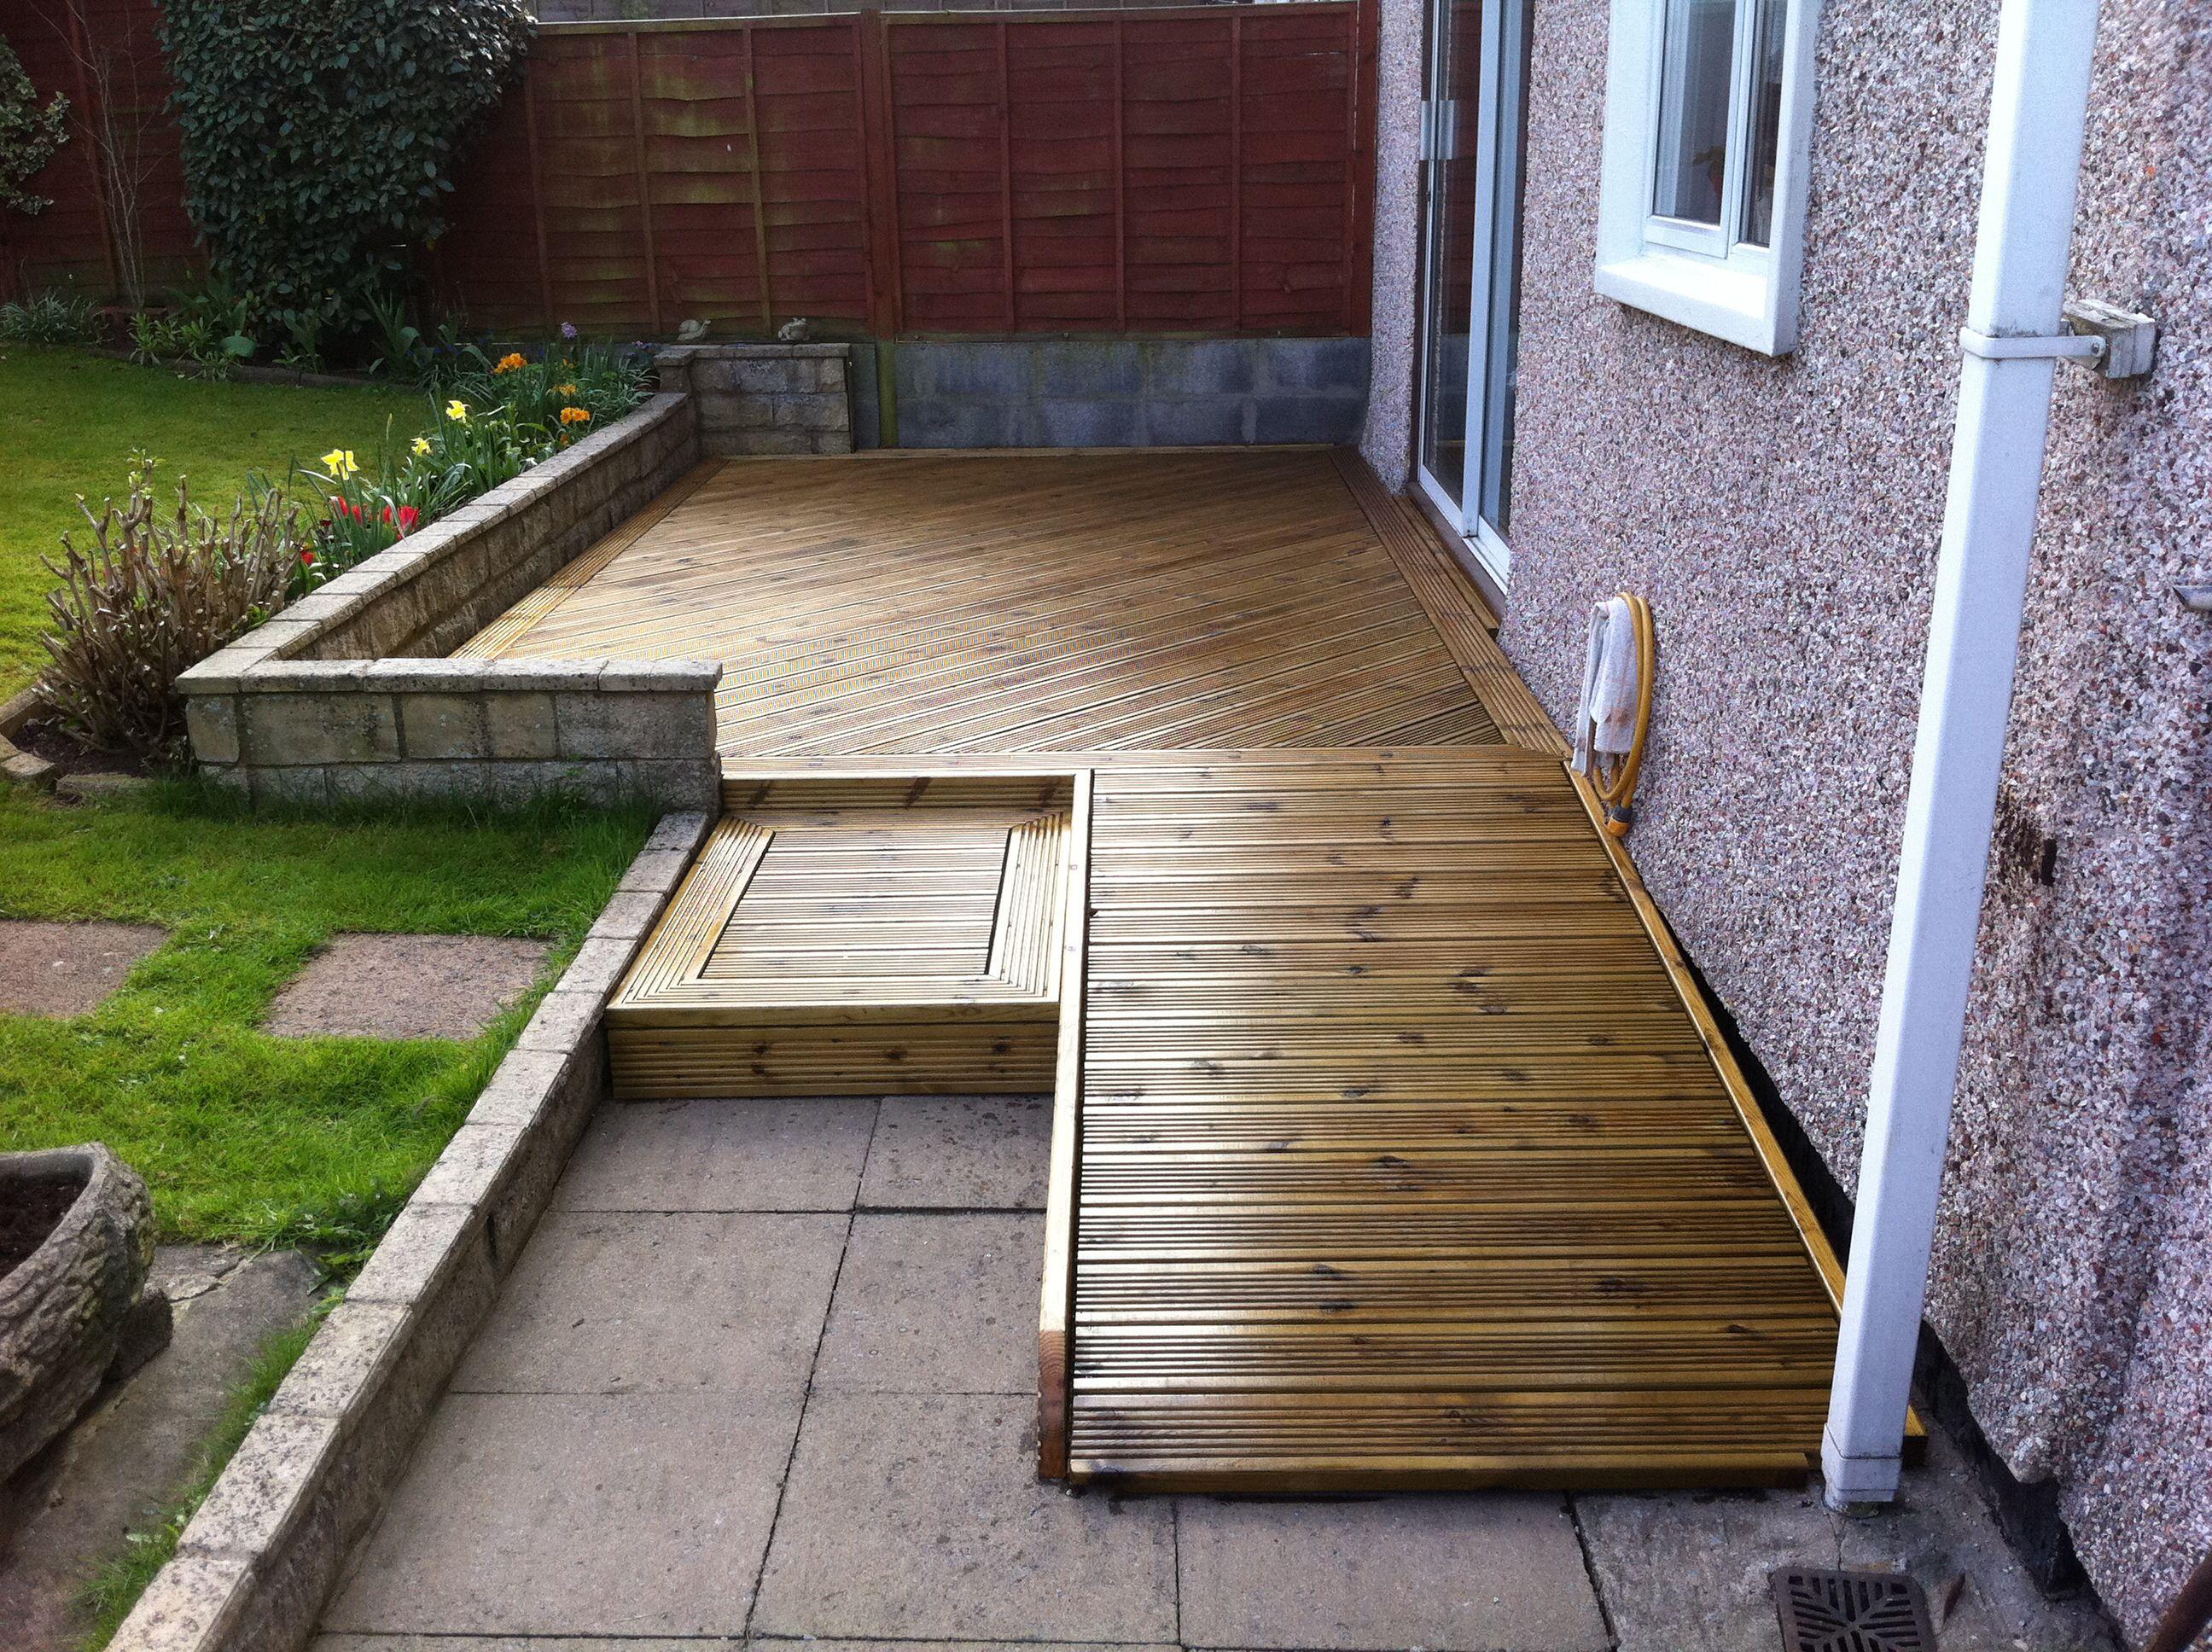 decking with ramp backyard fence ideas pinterest decking